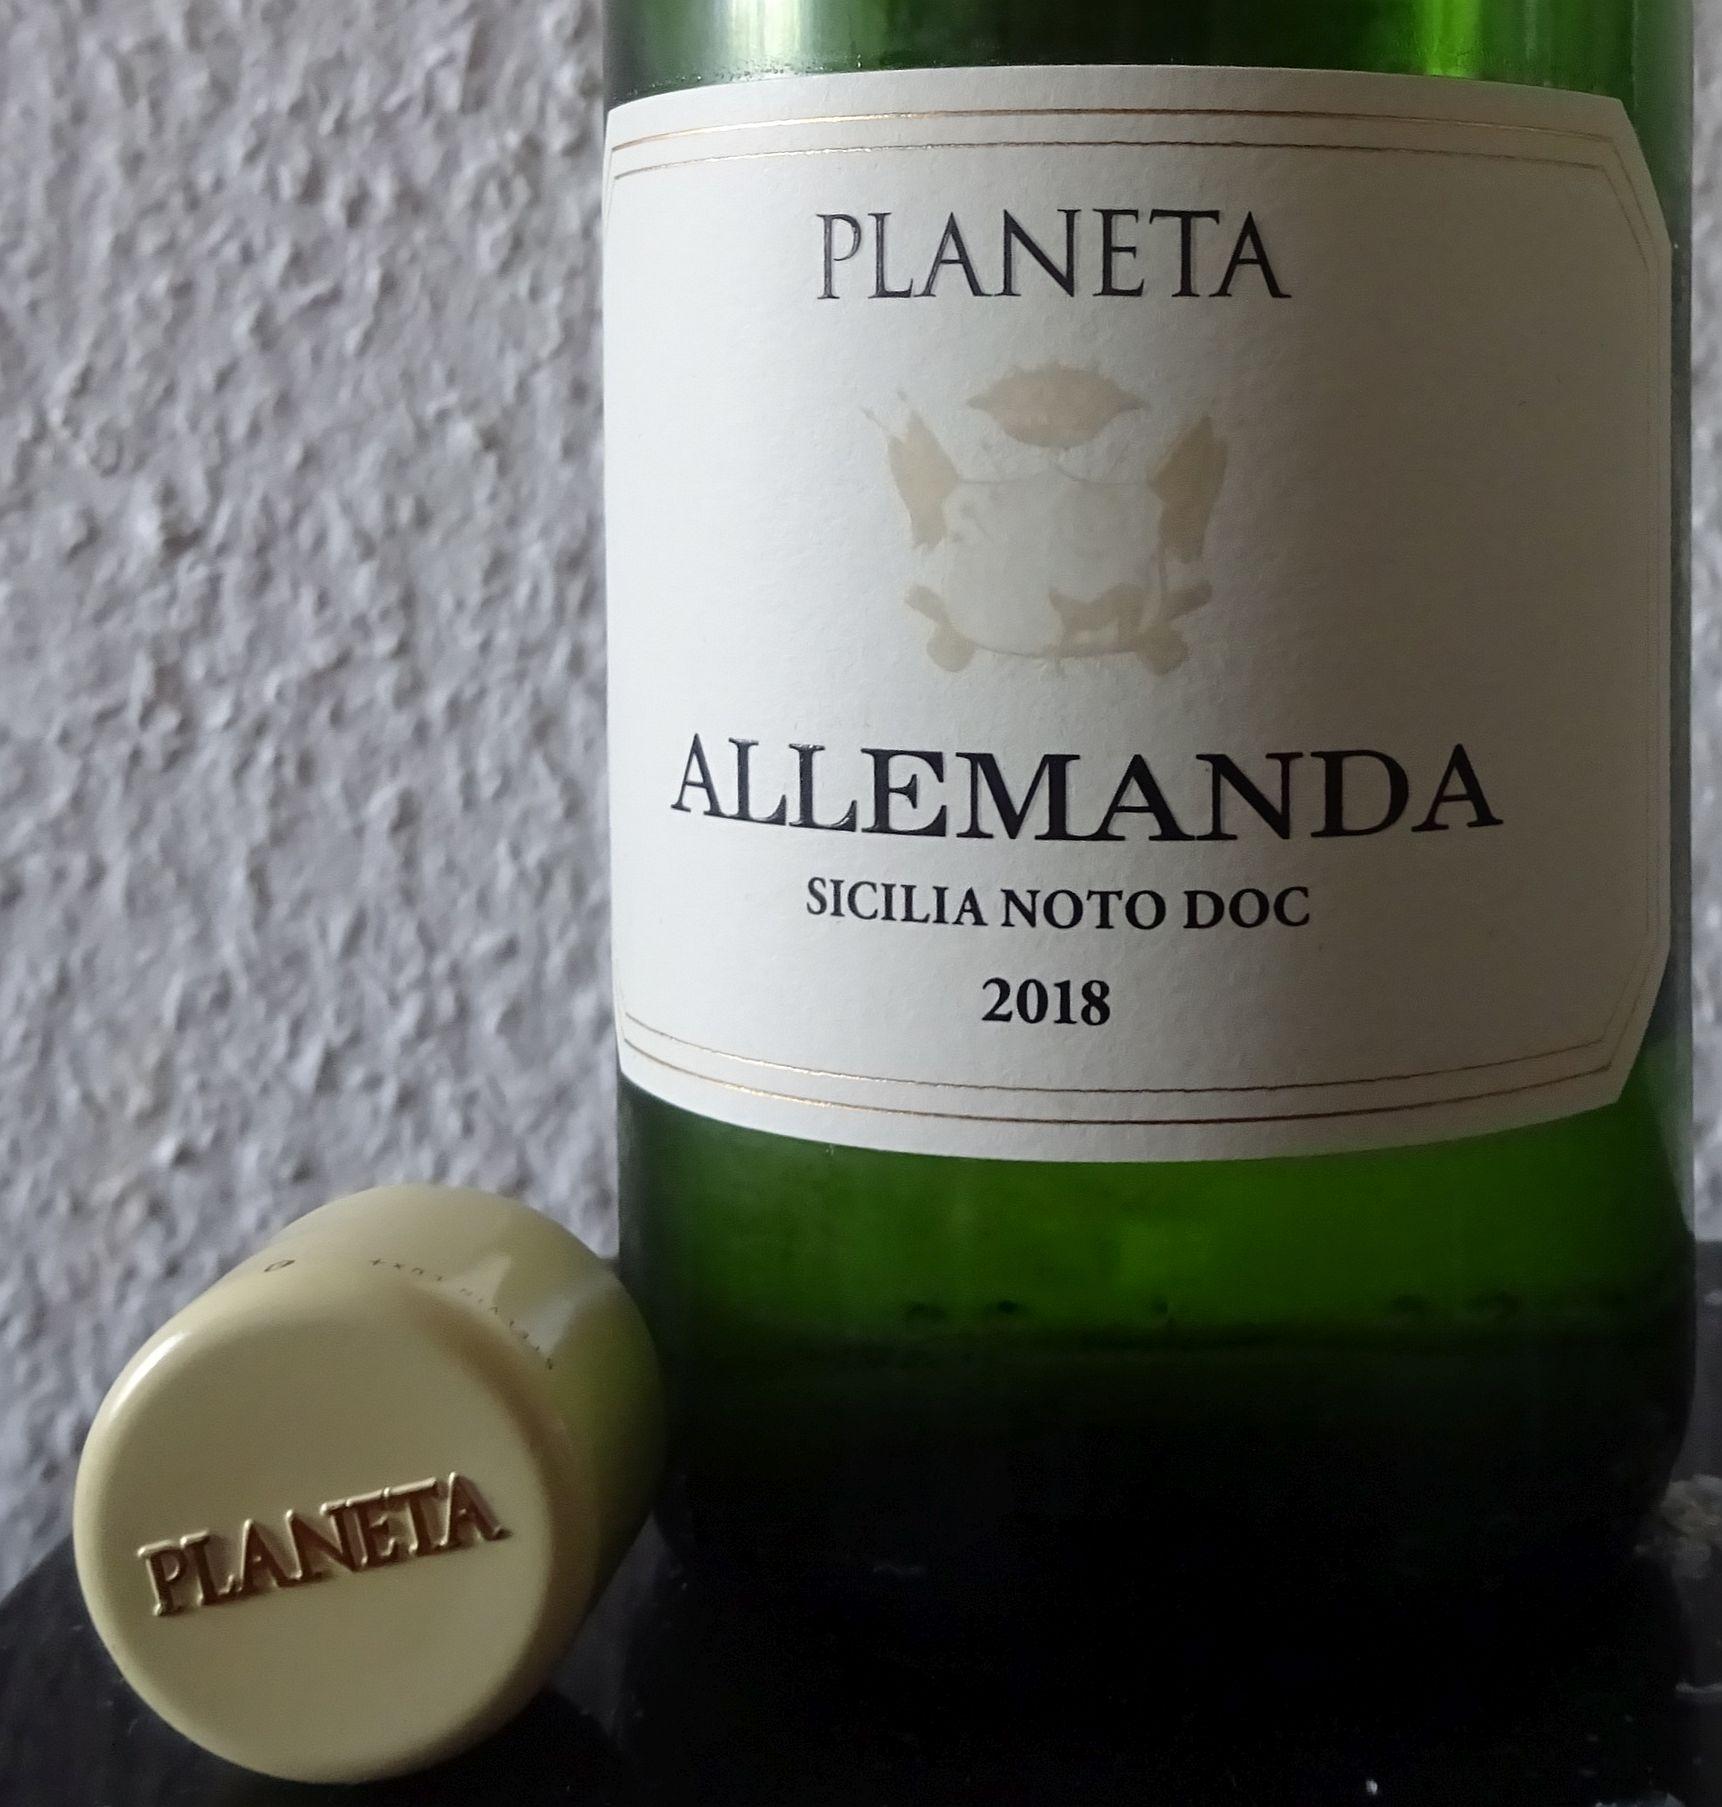 planetaallemanda2018_1.jpg